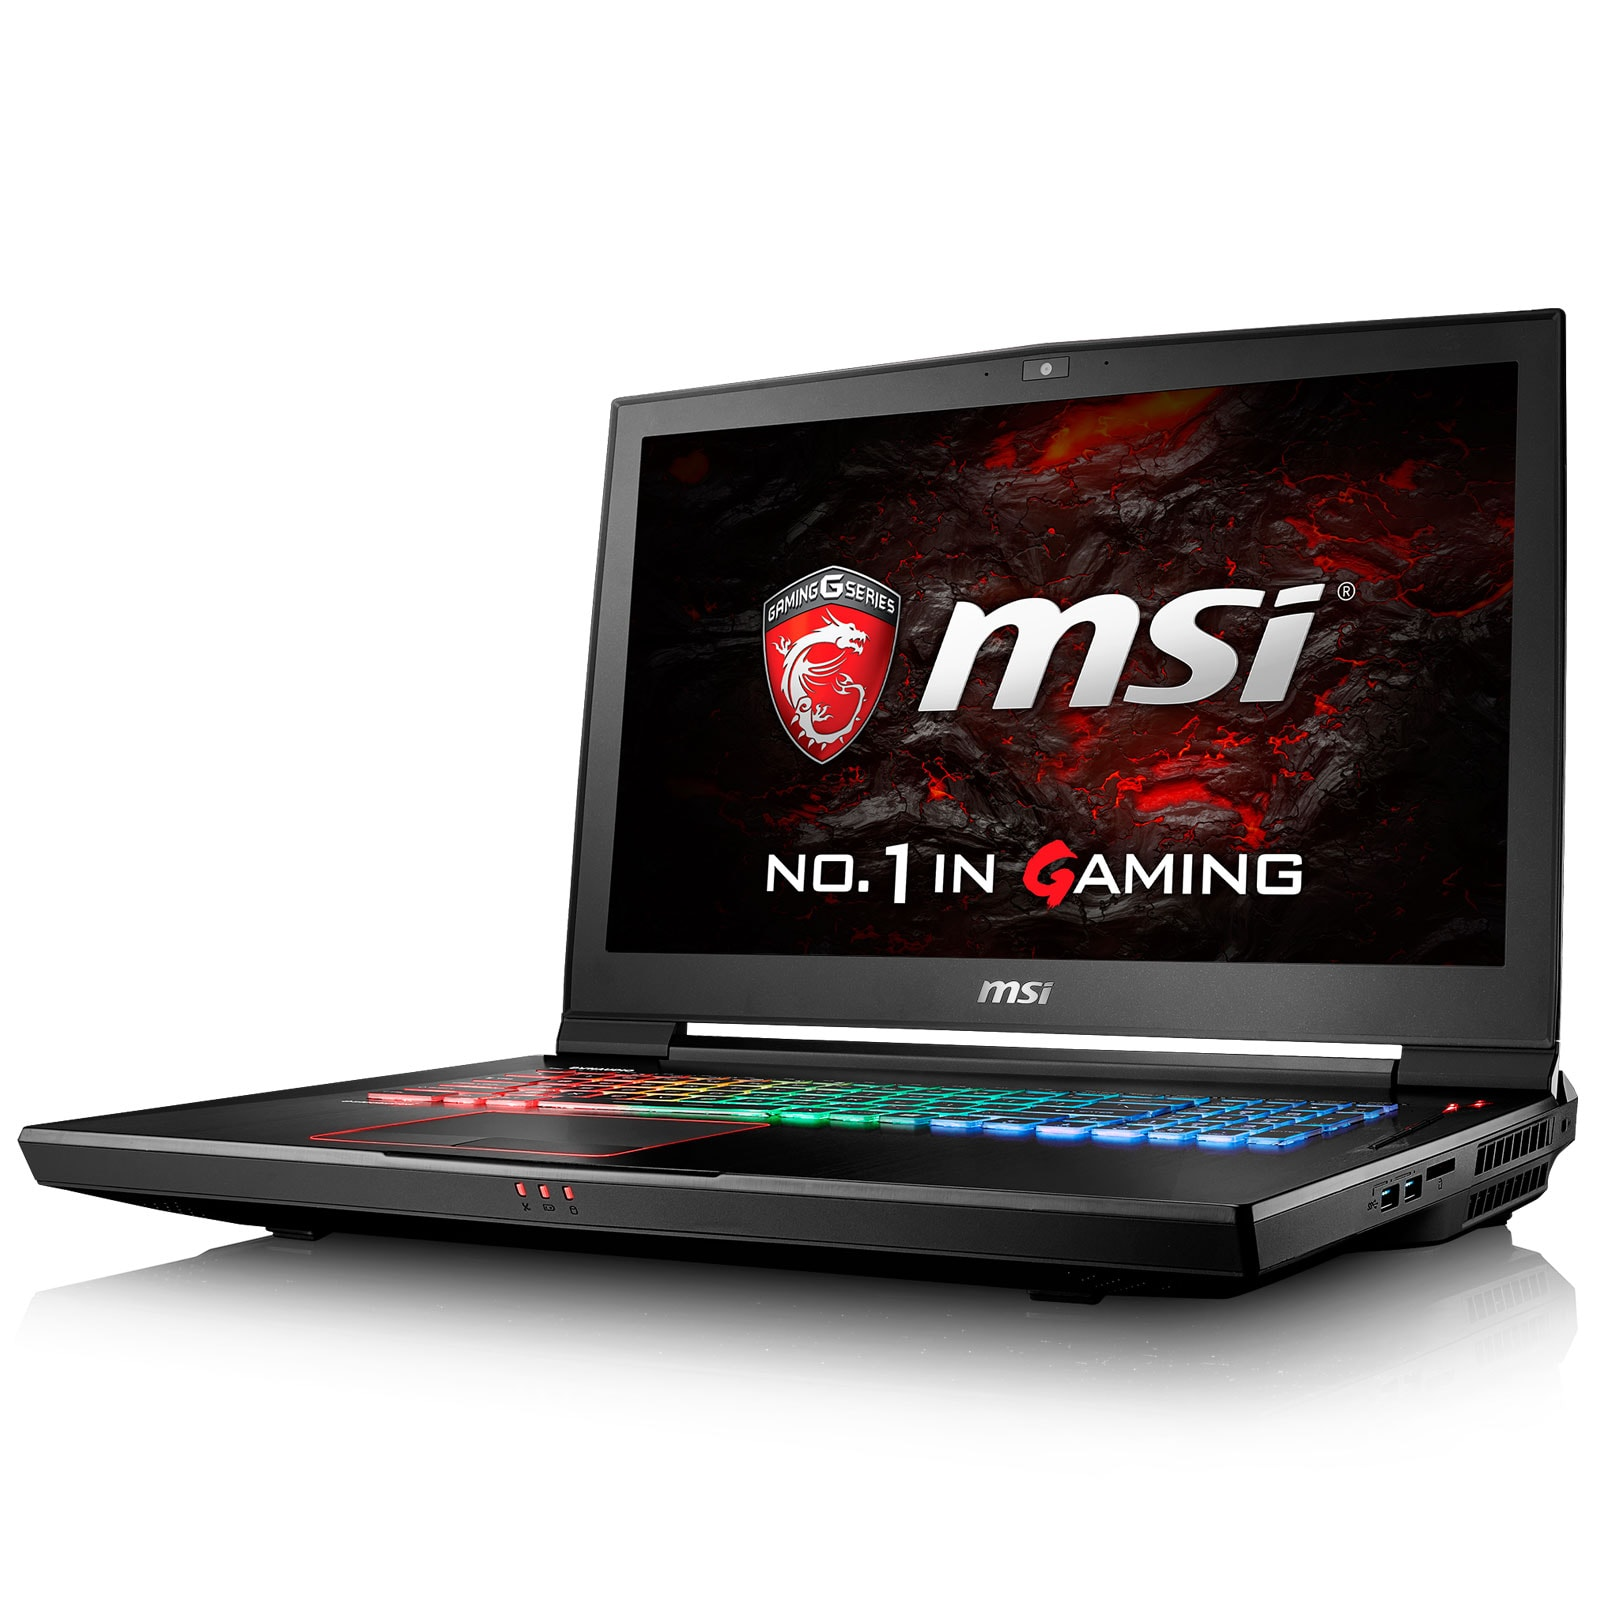 MSI 9S7-17A121-488 - PC portable MSI - Cybertek.fr - 4